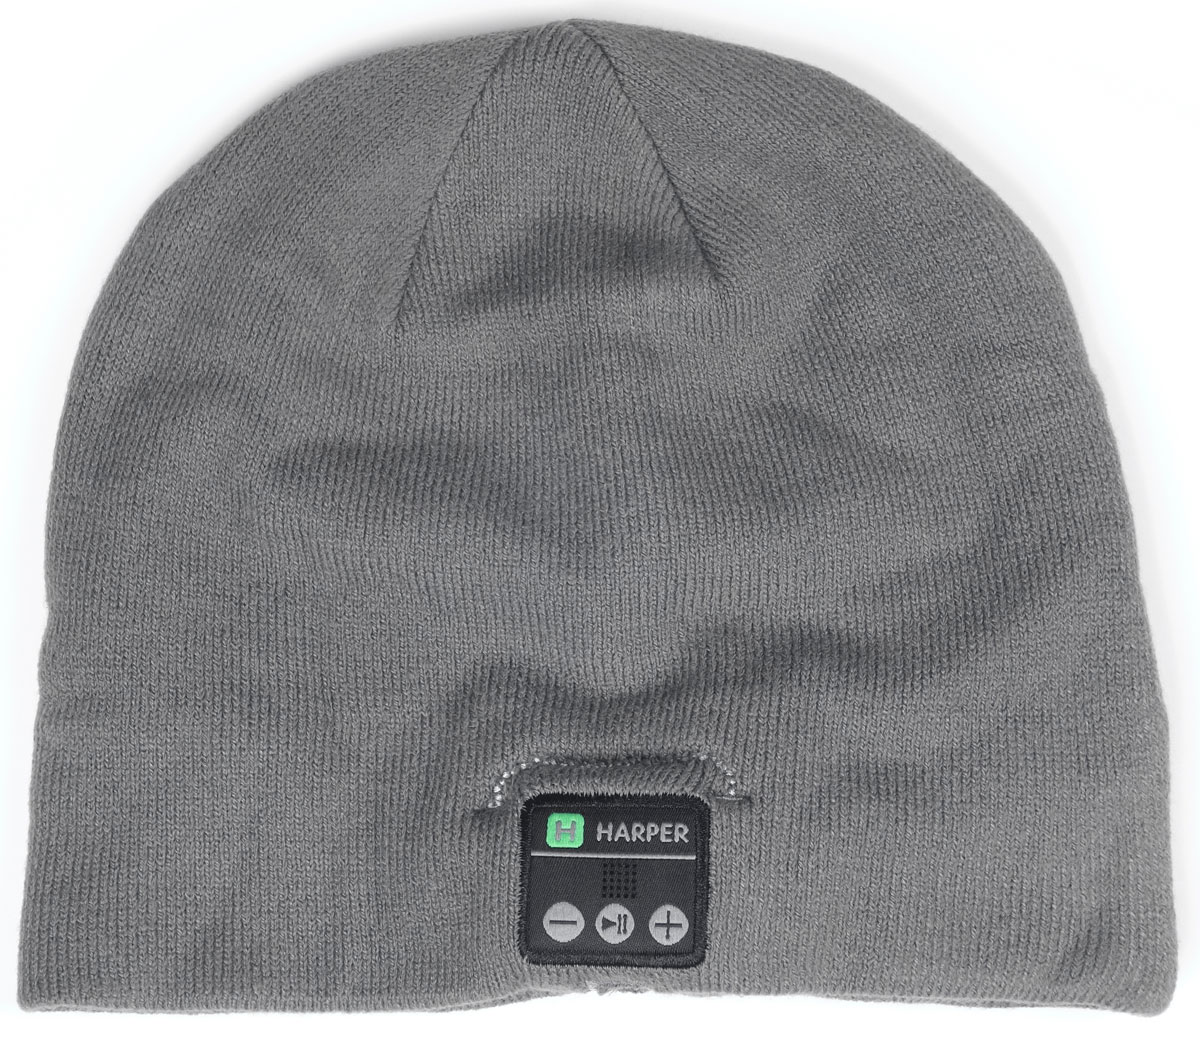 Harper HB-505, Gray шапка с Bluetooth-гарнитурой - Bluetooth-гарнитуры